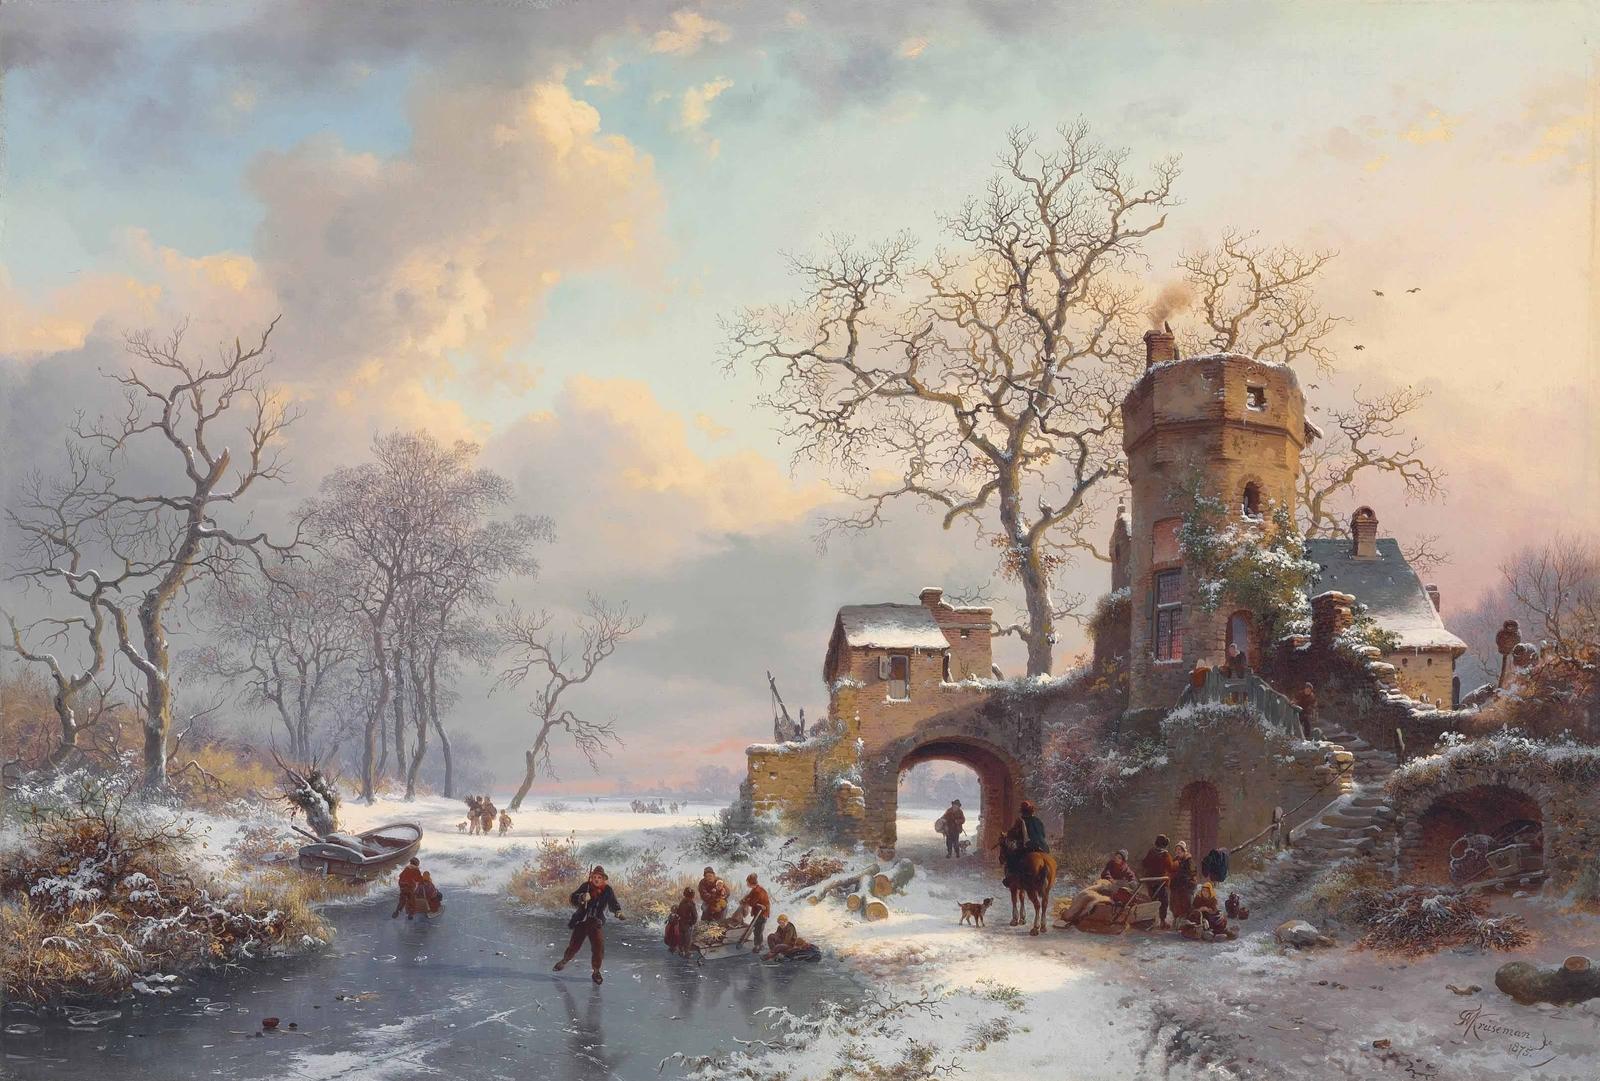 Frederik Marinus Kruseman – private collection.  Title: Winter Landscape with Figures on the Ice. Date: 1875. Materials: oil on canvas. Dimensions: 45.6 x 70.5 cm. Source: http://4.bp.blogspot.com/-dKsWT9cIR7A/VoM2fUJkjLI/AAAAAAAA3gI/LCJPAUVpok8/s1600/1875_%25D0%2597%25D0%25B8%25D0%25BC%25D0%25BD%25D0%25B8%25D0%25B9%2B%25D0%25BF%25D0%25B5%25D0%25B9%25D0%25B7%25D0%25B0%25D0%25B6%2B%25D1%2581%2B%25D1%2584%25D0%25B8%25D0%25B3%25D1%2583%25D1%2580%25D0%25B0%25D0%25BC%25D0%25B8%2B%25D0%25BD%25D0%25B0%2B%25D0%25BB%25D1%258C%25D0%25B4%25D1%2583%2B%2528Winter%2Blandscape%2Bwith%2Bfigures%2Bon%2Bthe%2Bice%2529_45.6%2B%25D1%2585%2B70.5_%25D1%2585.%252C%25D0%25BC._%25D0%25A7%25D0%25B0%25D1%2581%25D1%2582%25D0%25BD%25D0%25BE%25D0%25B5%2B%25D1%2581%25D0%25BE%25D0%25B1%25D1%2580%25D0%25B0%25D0%25BD%25D0%25B8%25D0%25B5.jpg.